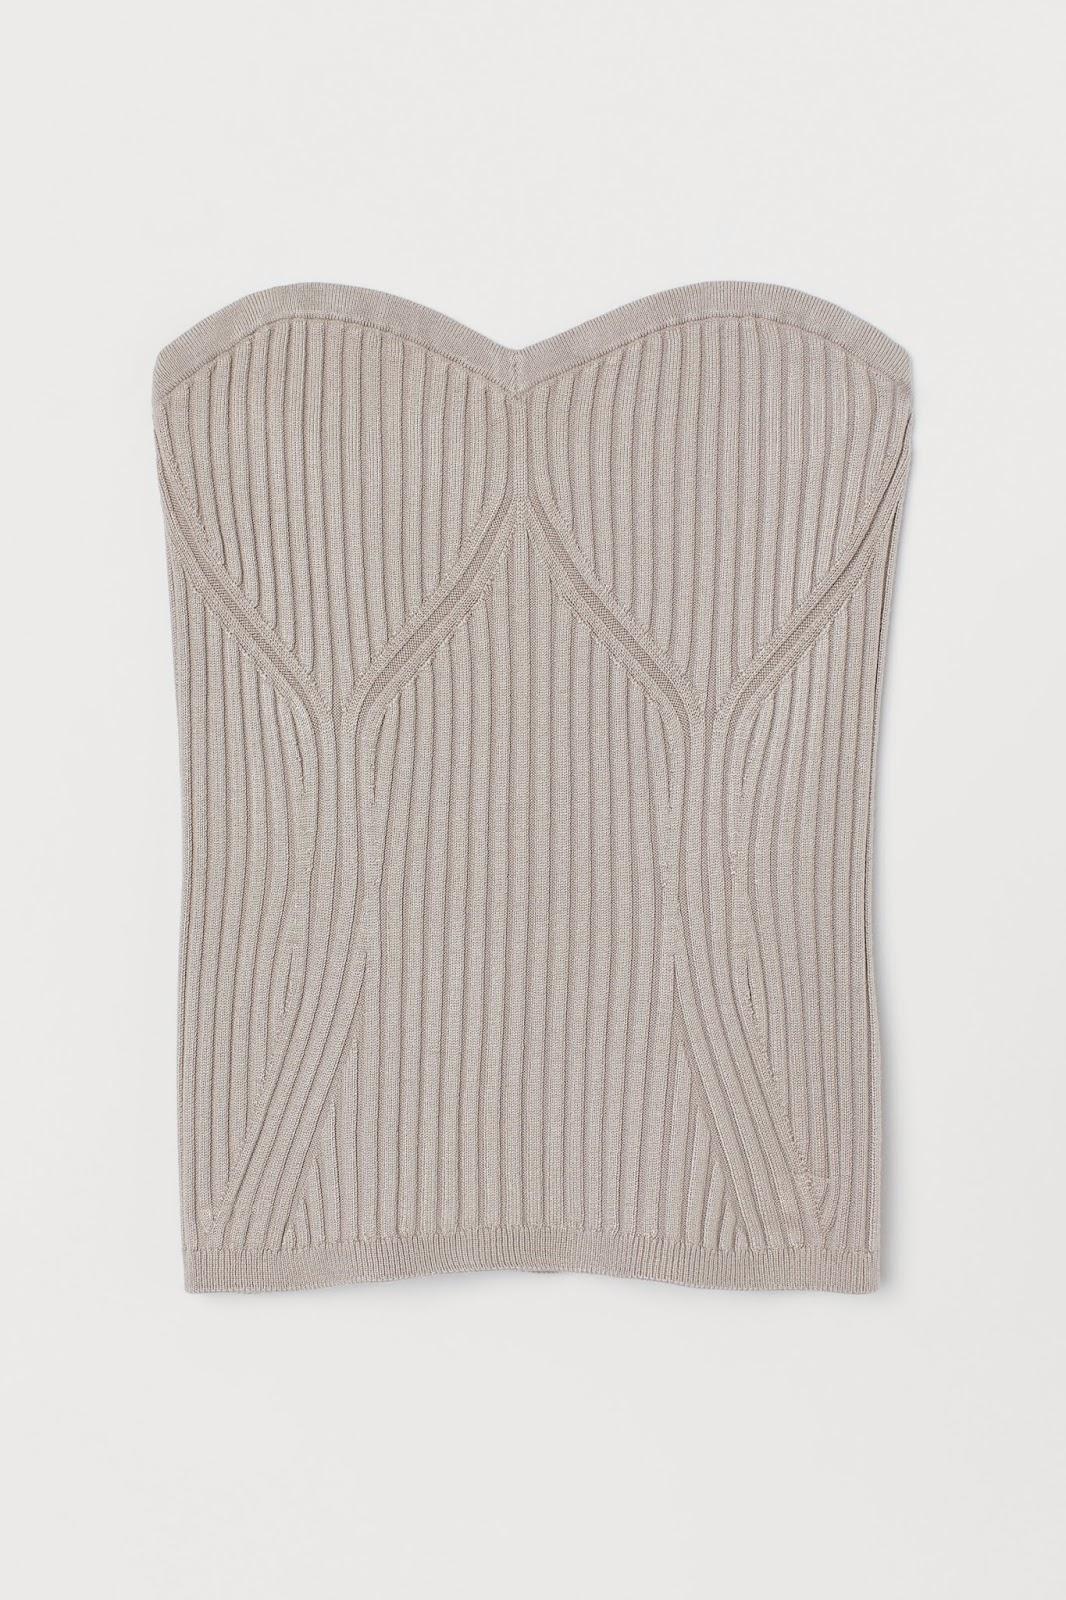 Get Katie Holme's Khaite Cashmere Bra Look for Less — Under-$50 Top